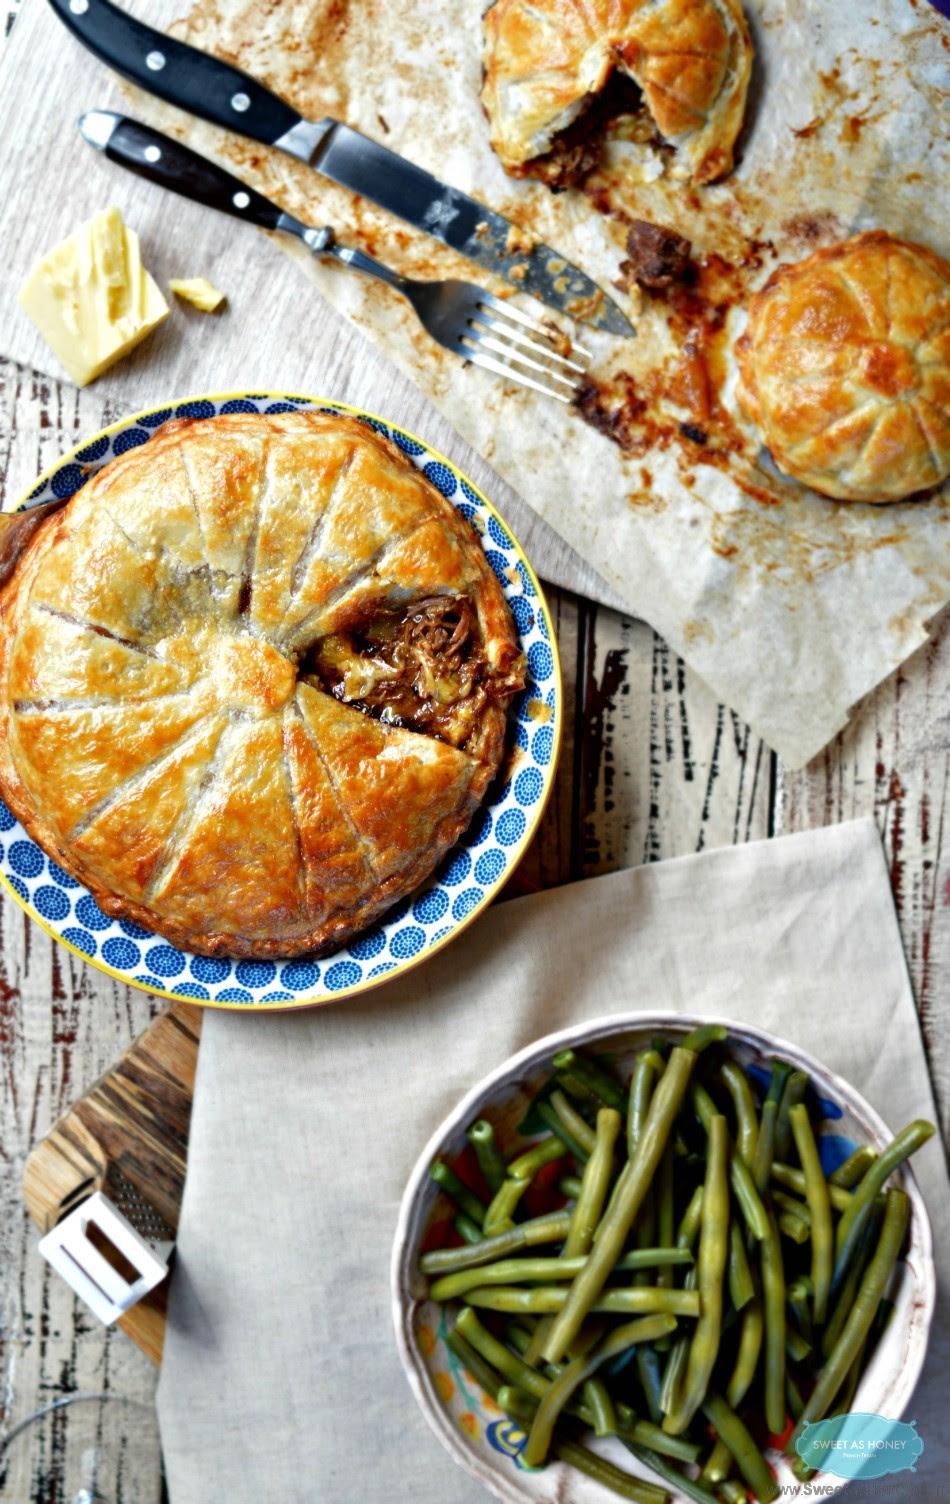 Steak Pie with cheddar|An easy meat pie recipe - Sweetashoney